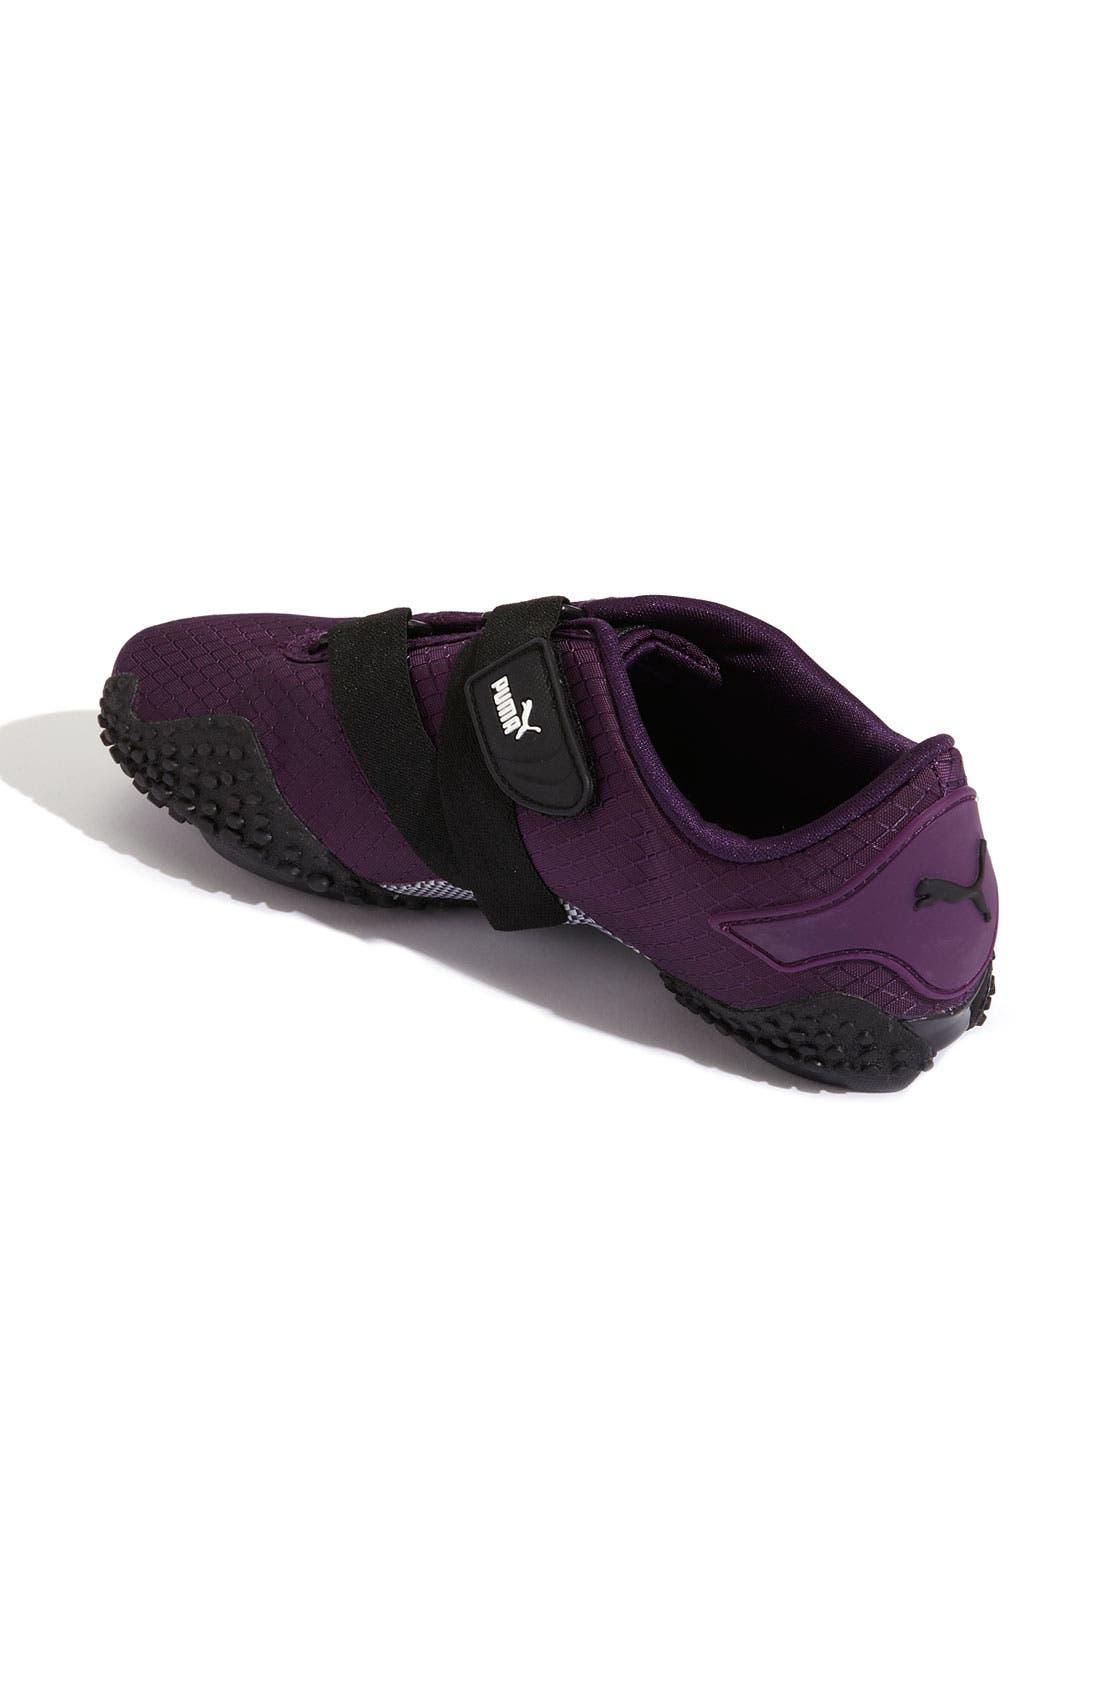 Alternate Image 2  - PUMA 'Mostro Ripstop 2' Sneaker (Women)